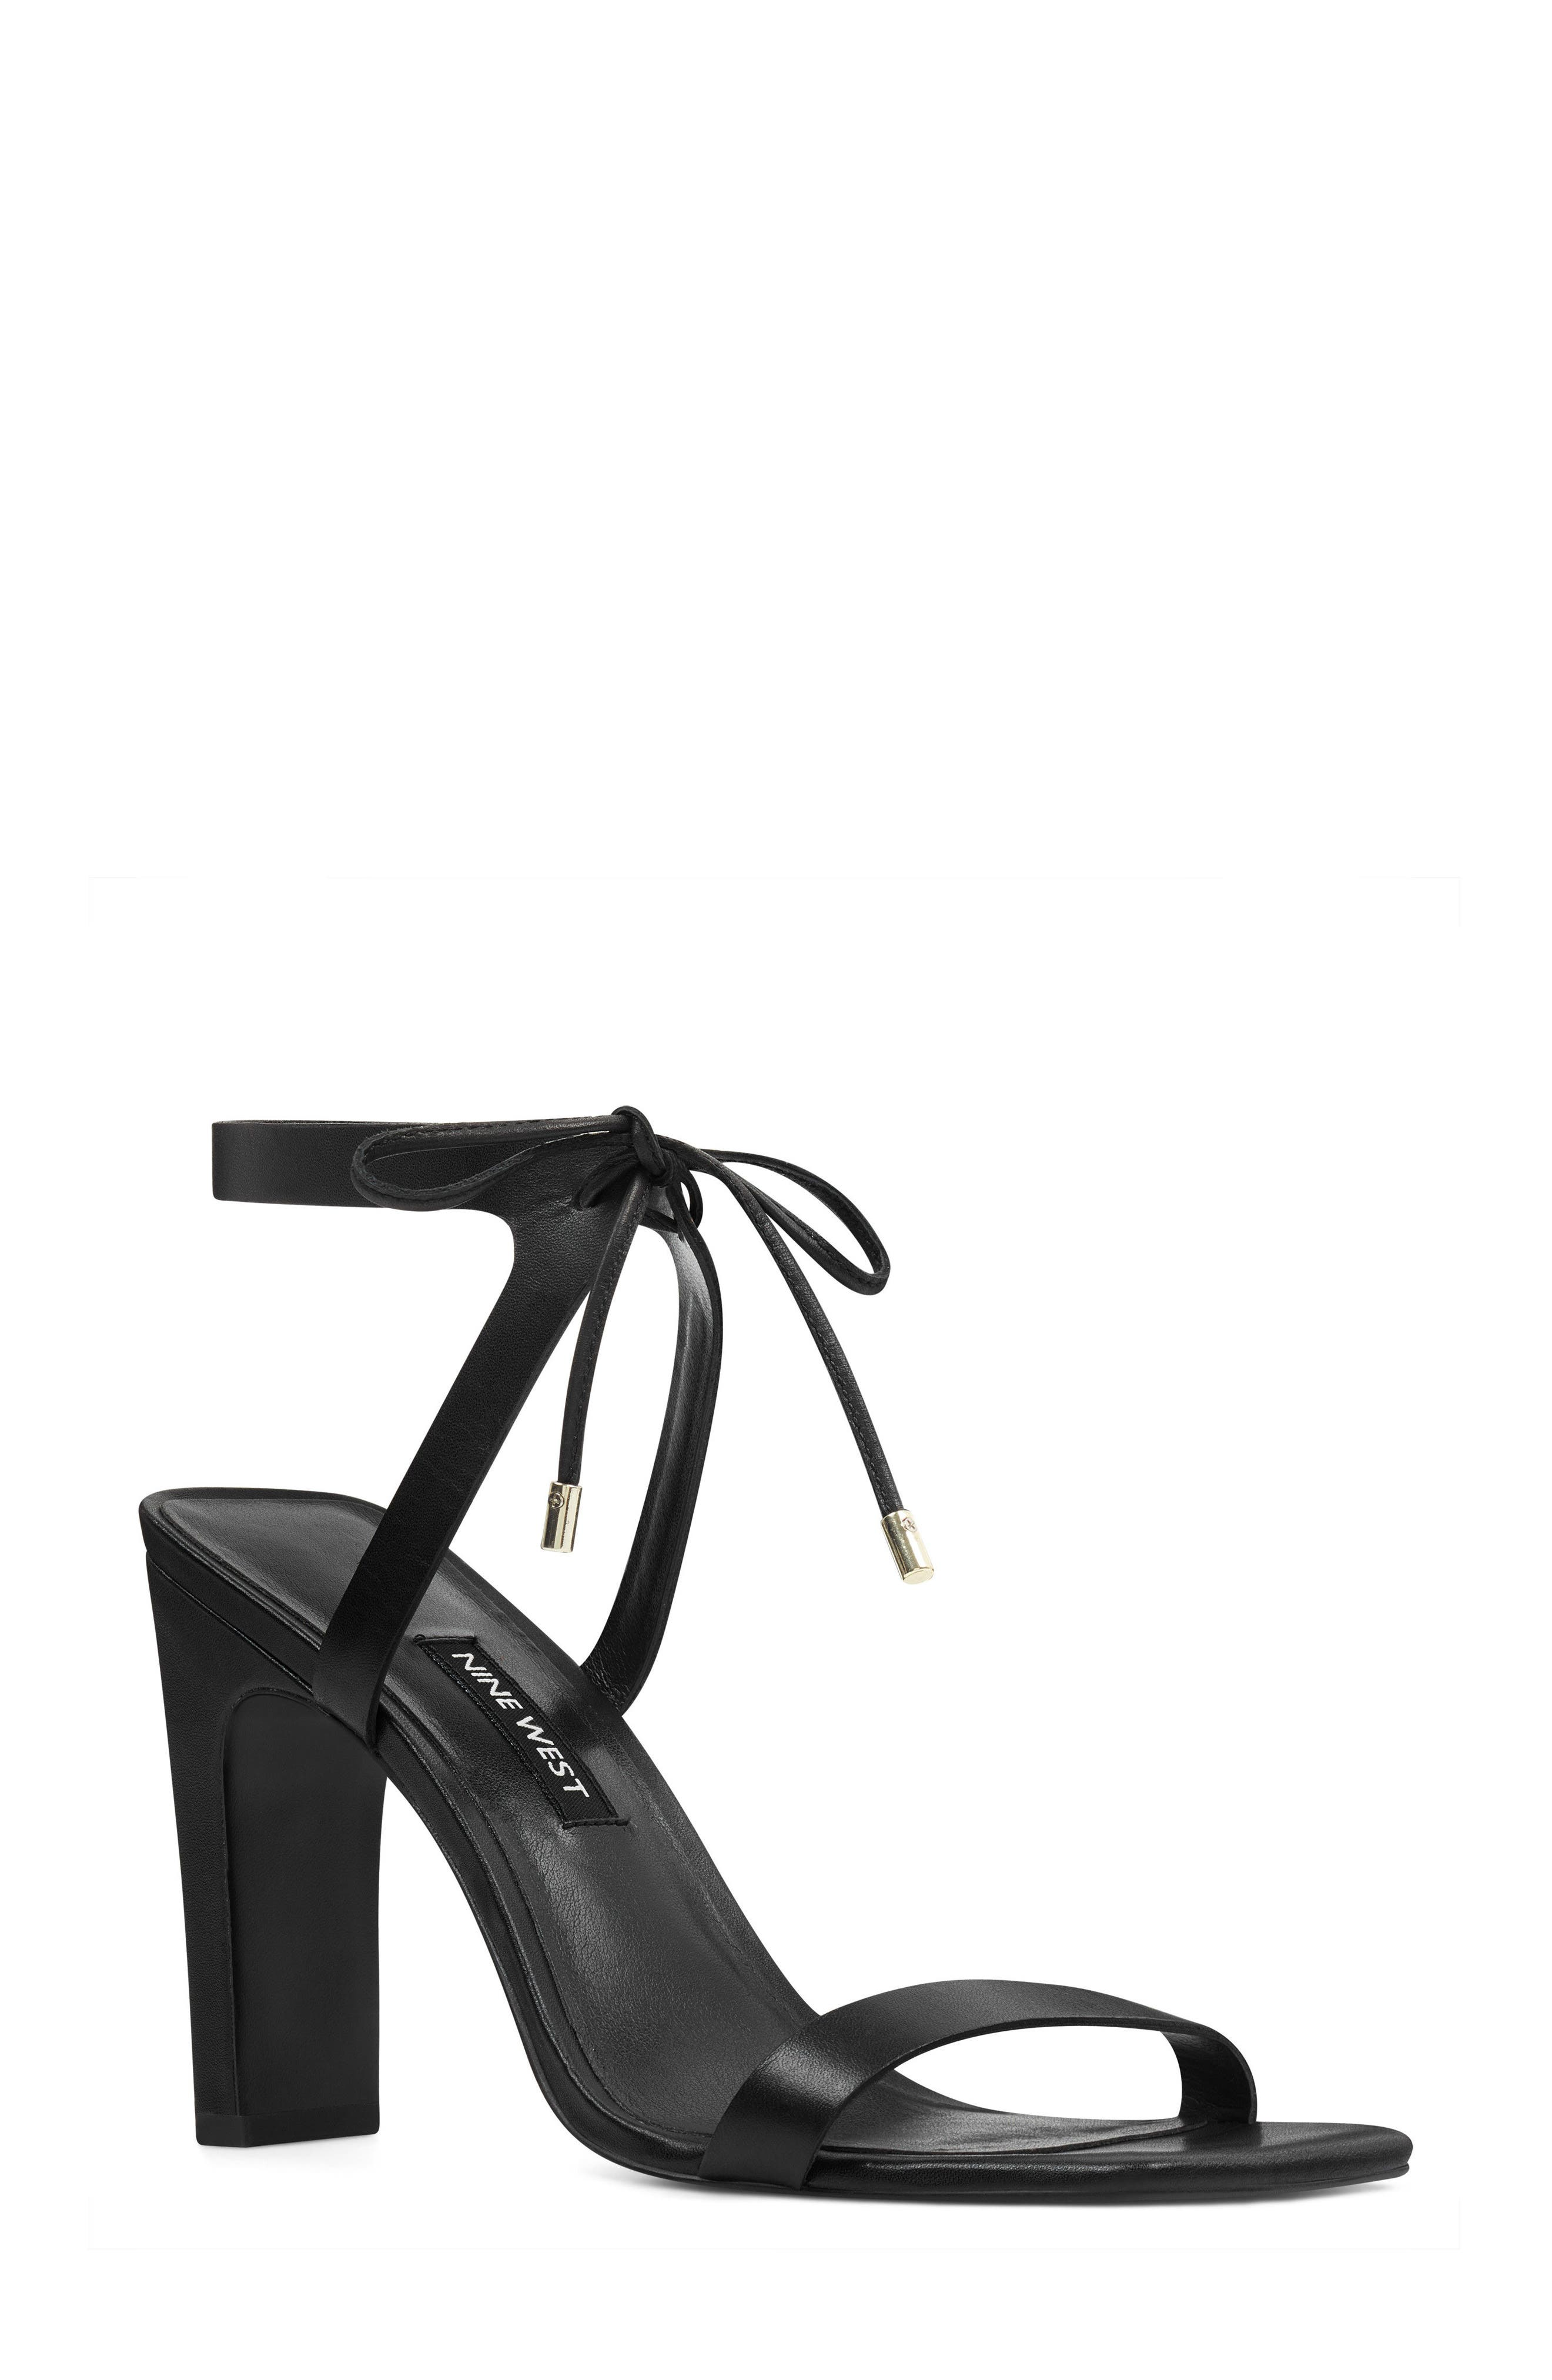 Longitano Squared Toe Sandal,                         Main,                         color, BLACK LEATHER